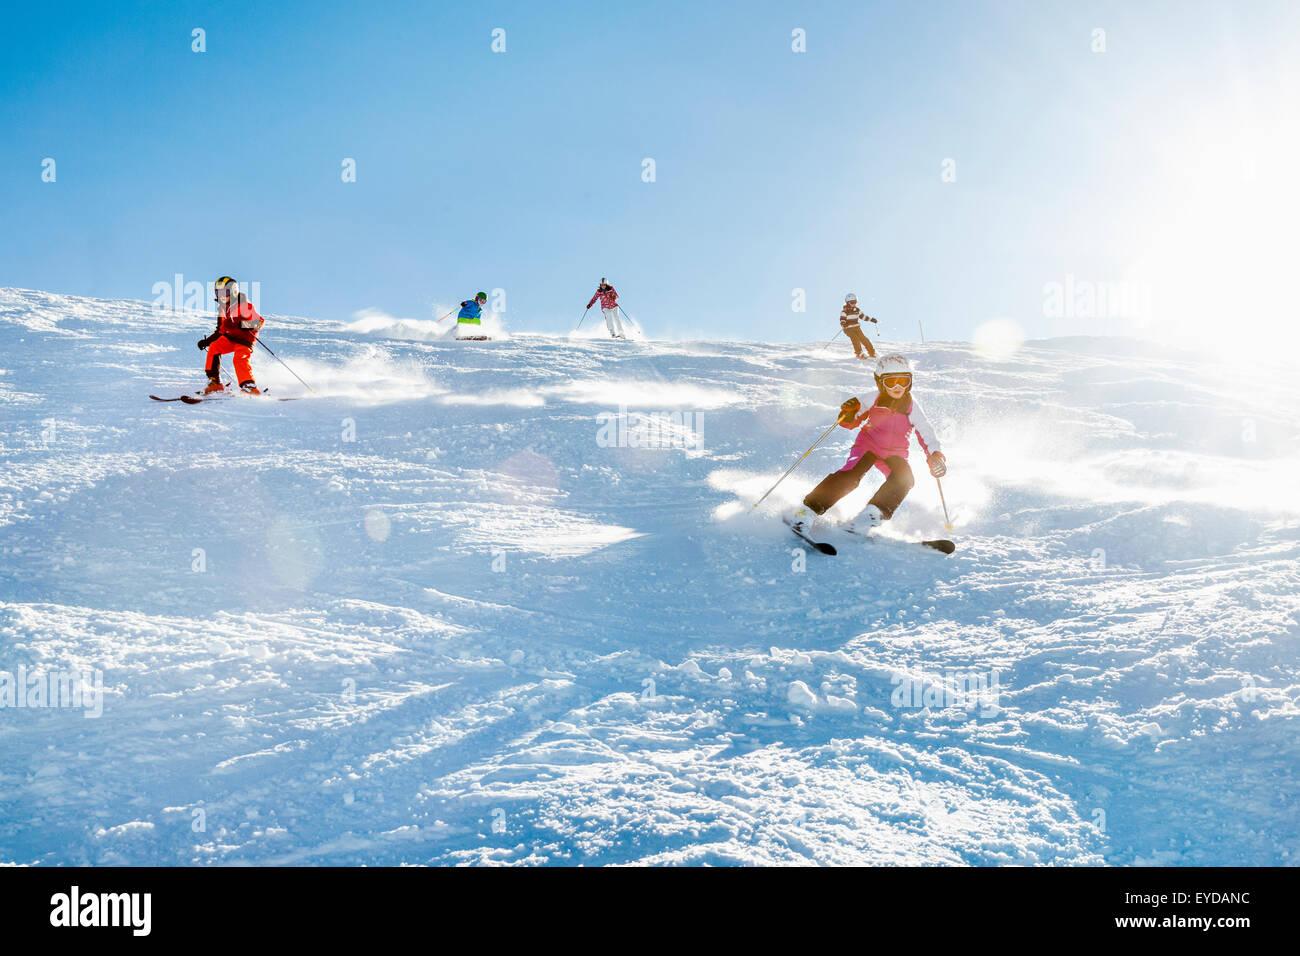 Ski holiday, Children carving downhill, Sudelfeld, Bavaria, Germany - Stock Image